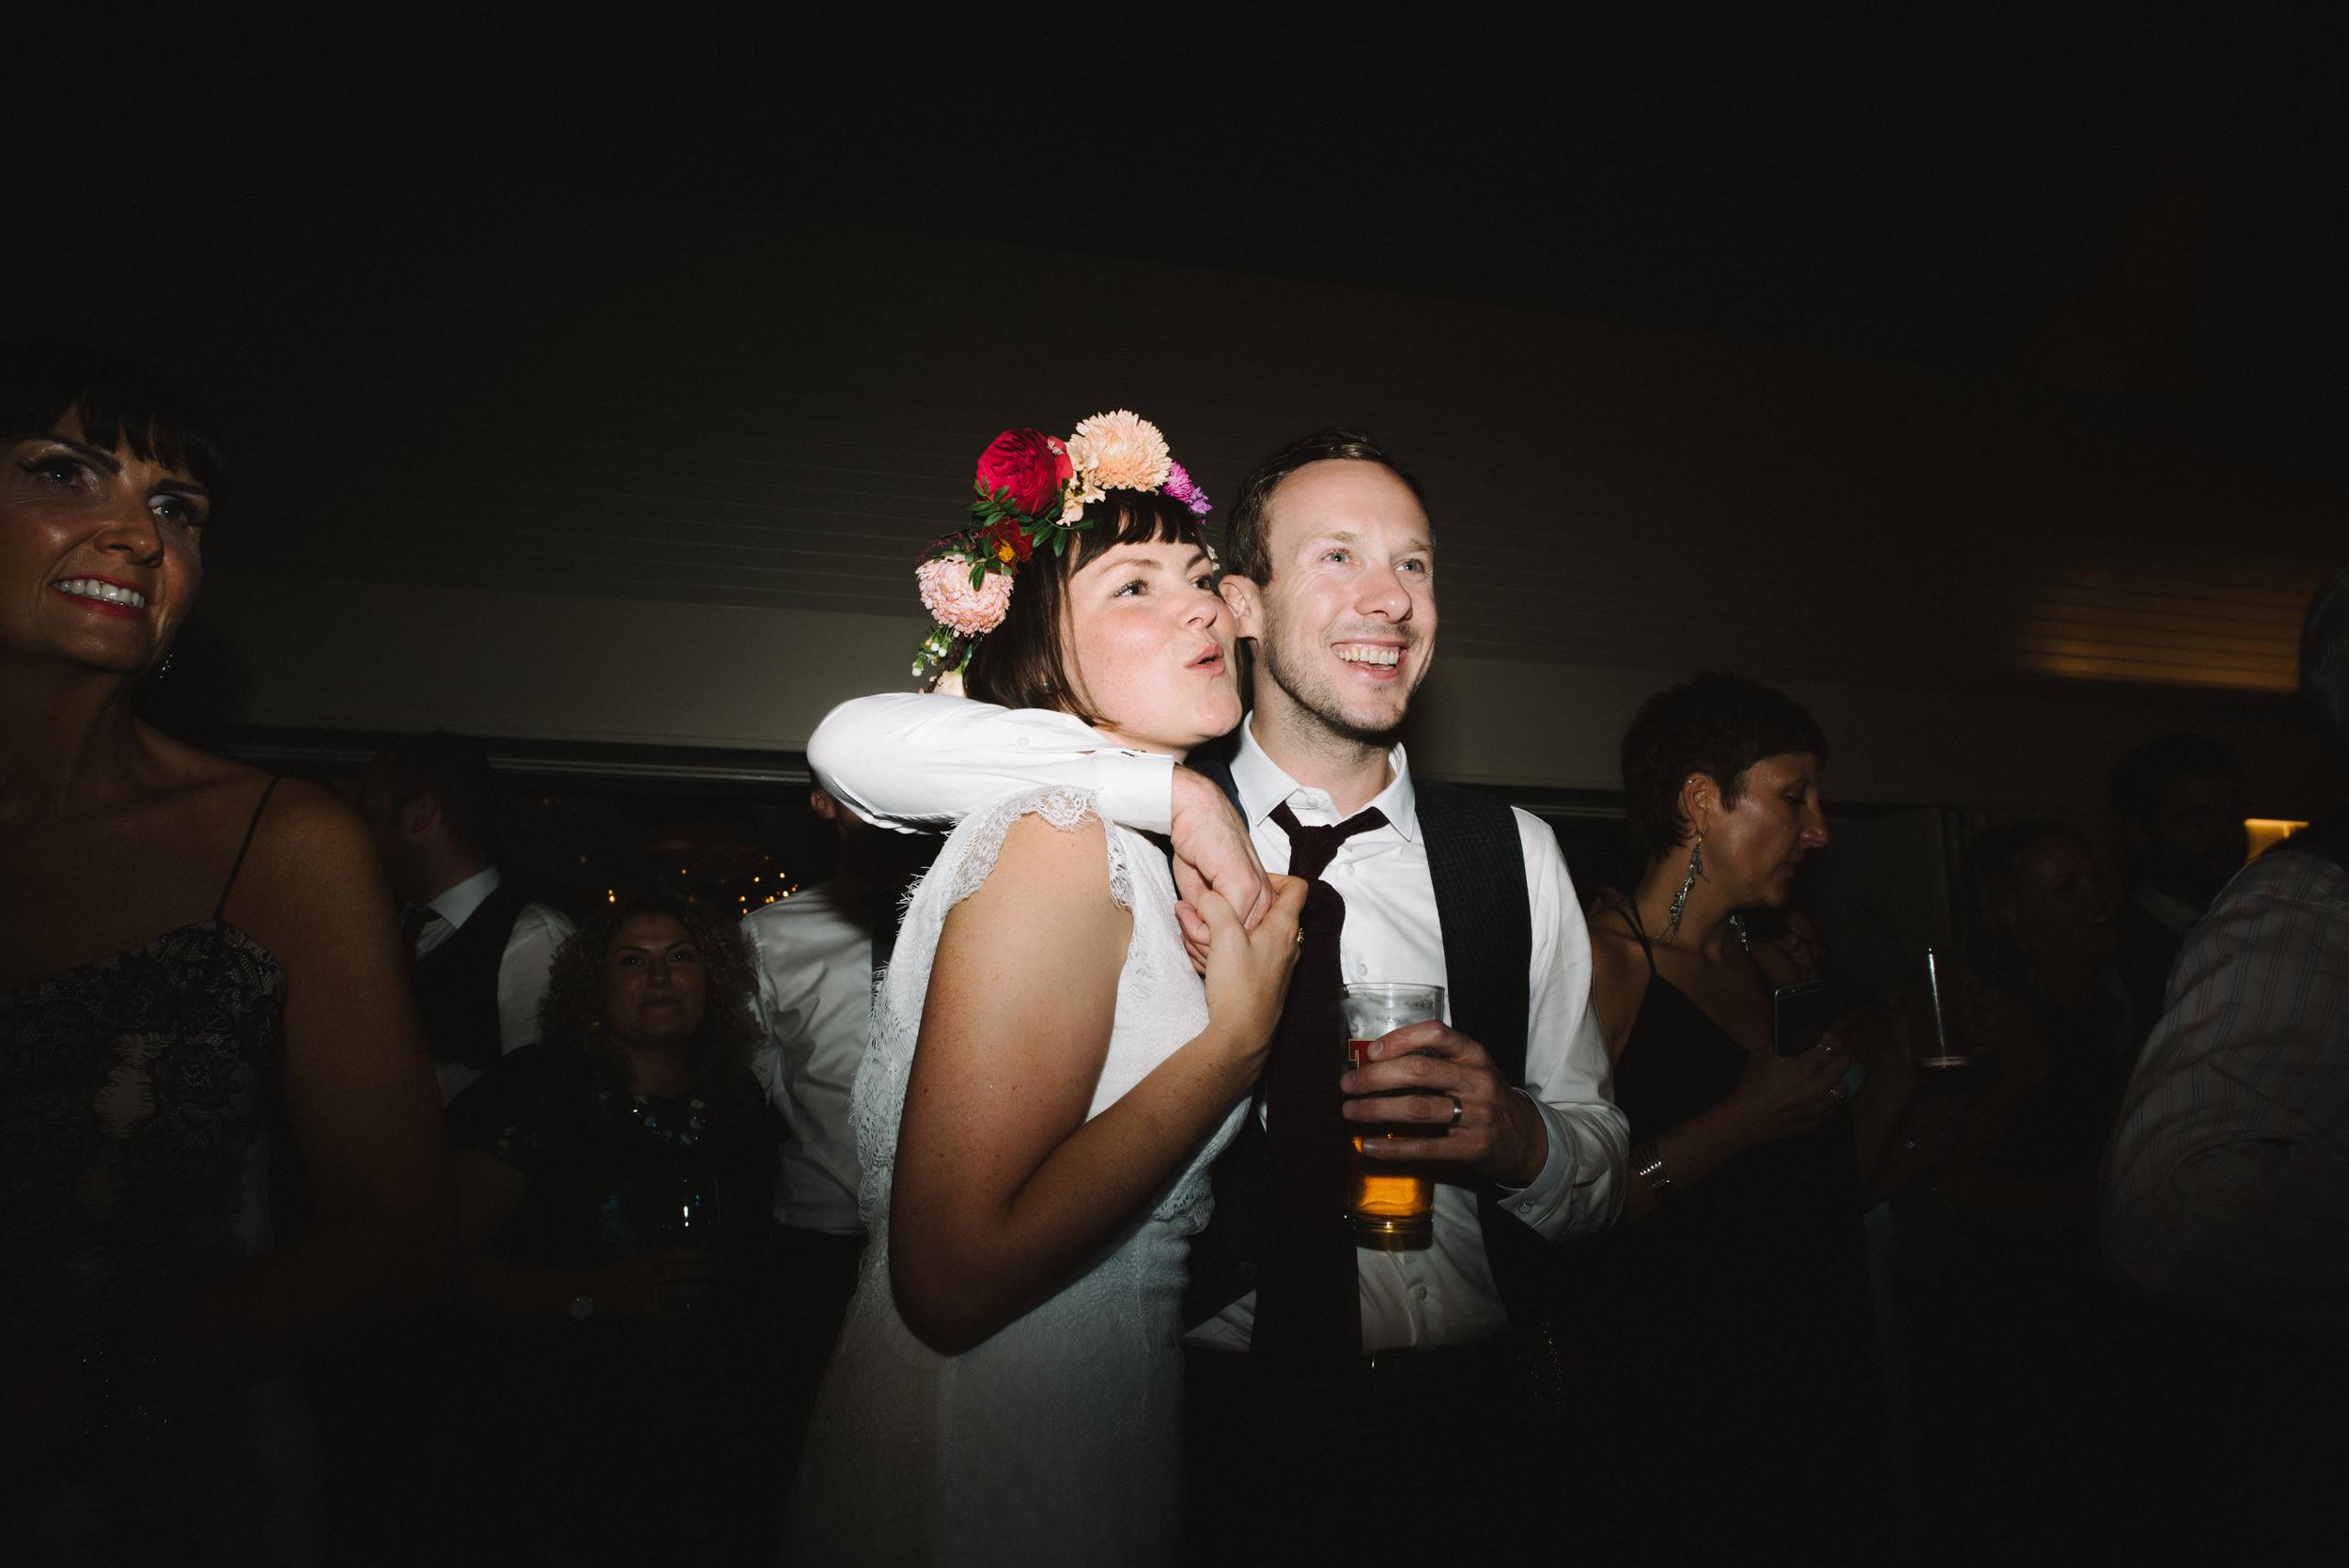 0154-alternative-wedding-portrait-family-kids-photographer-glasgow-scotland.JPG